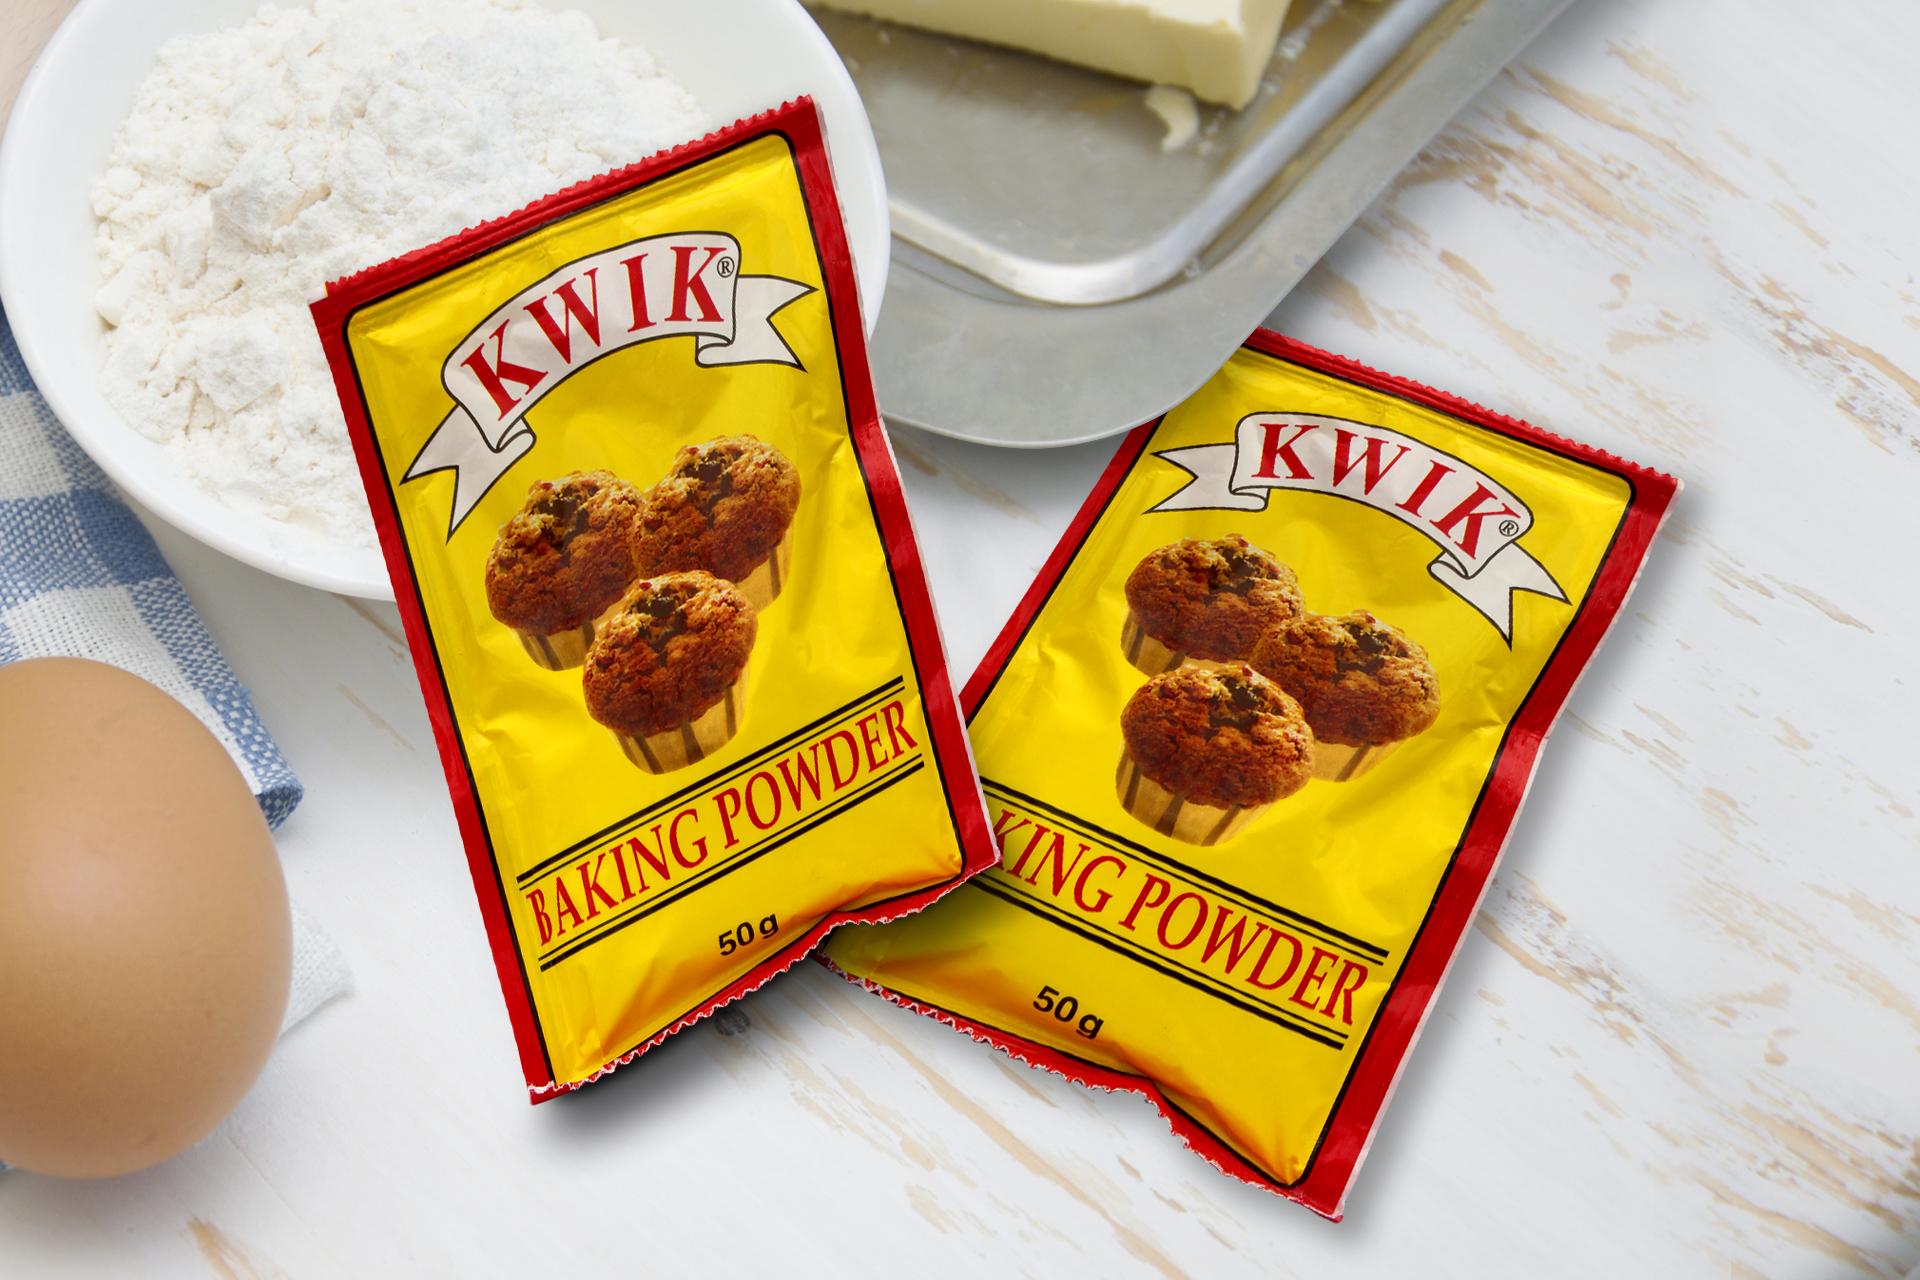 https://www.orbitsarl.com/wp-content/uploads/2017/08/Product-Cooking_Kwik-Baking-Powder-50g-Sachet_1920x1280-FIN.jpg